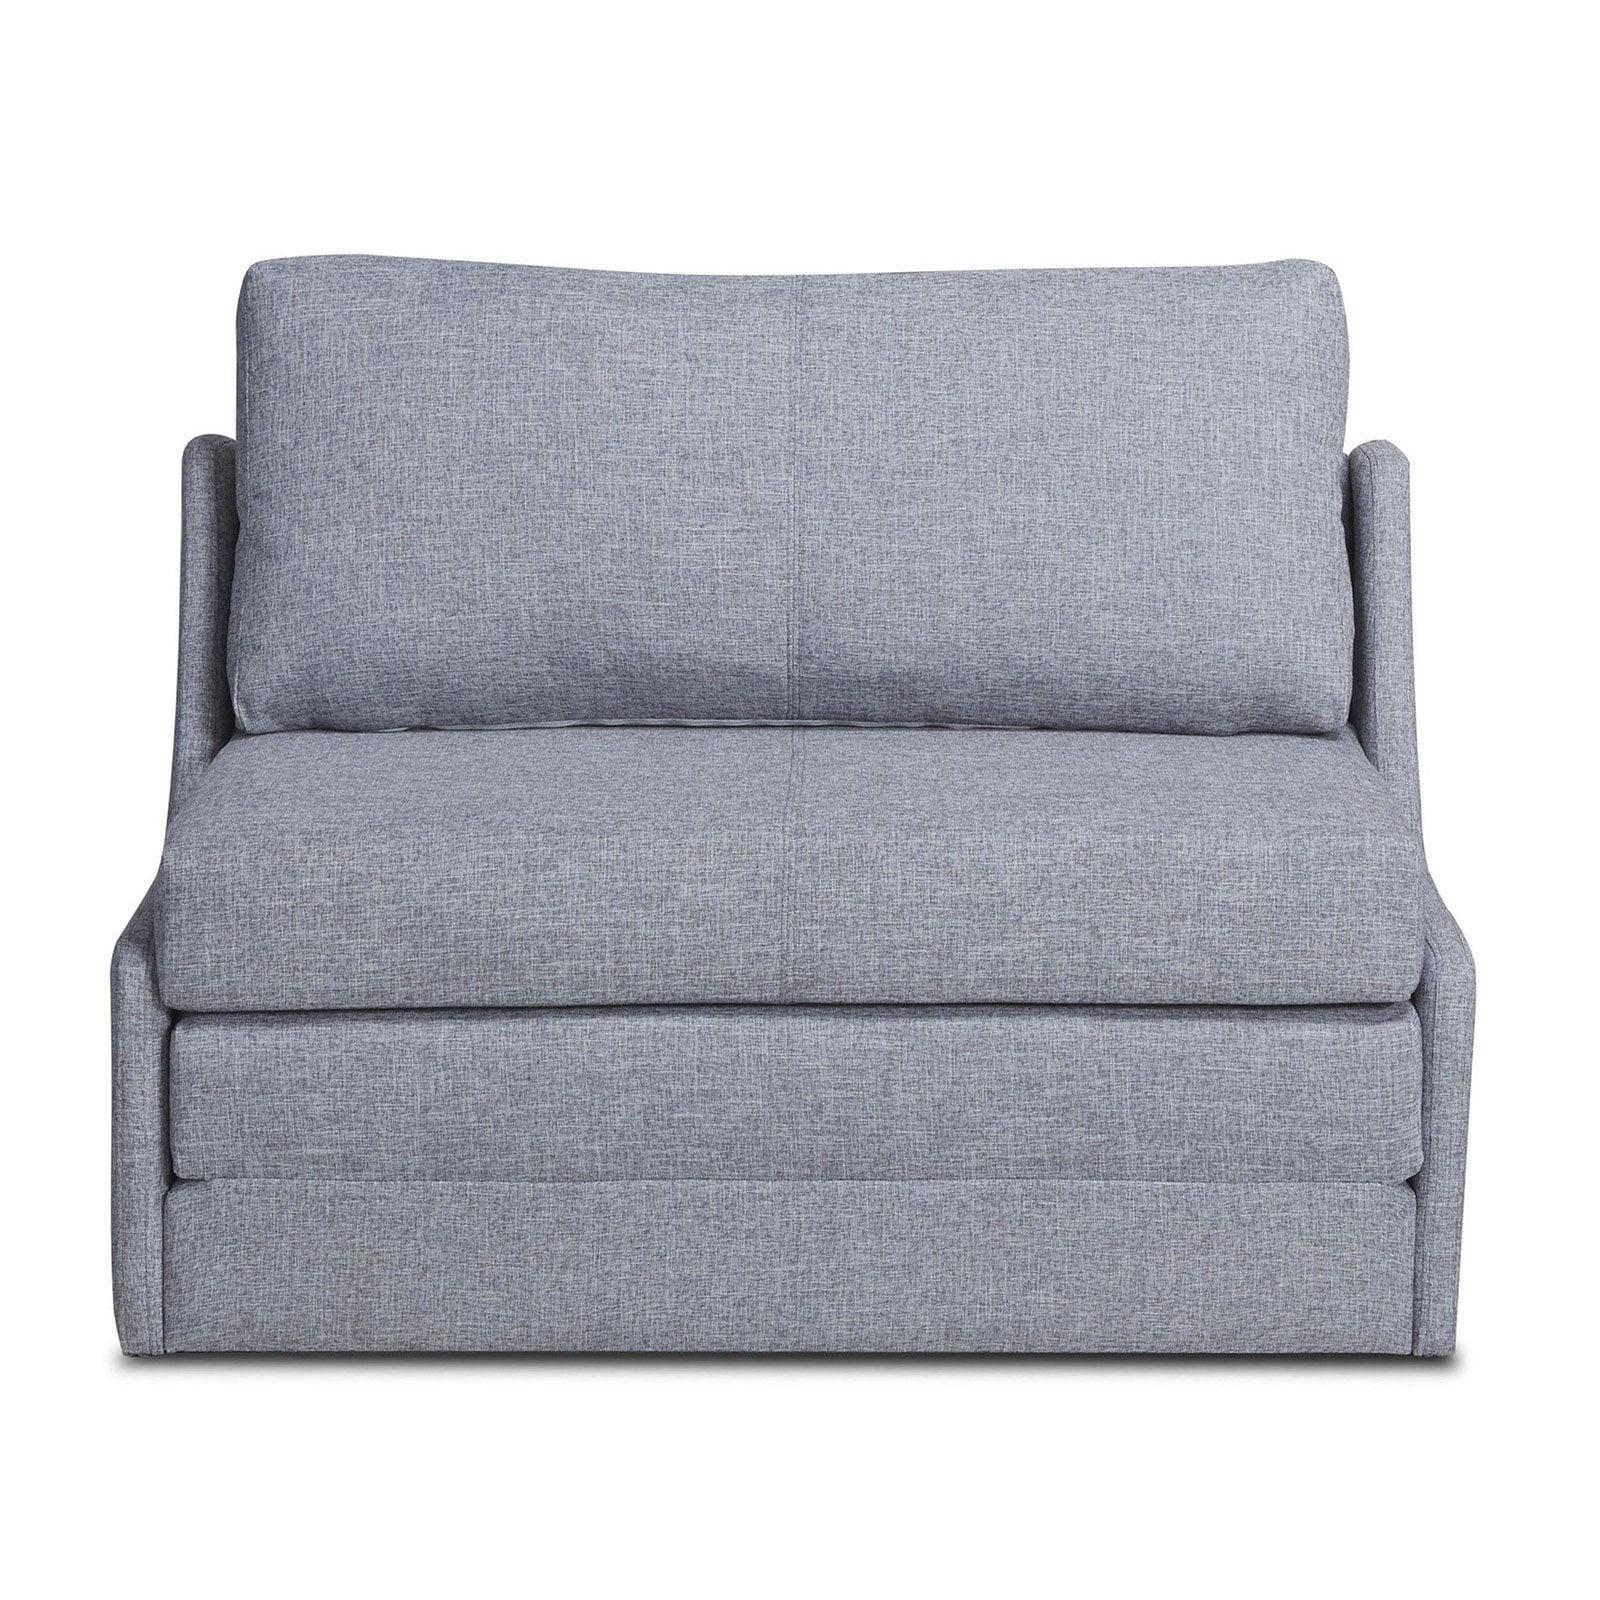 Terrific Gold Sparrow Albany Convertible Sleeper Loveseat Machost Co Dining Chair Design Ideas Machostcouk